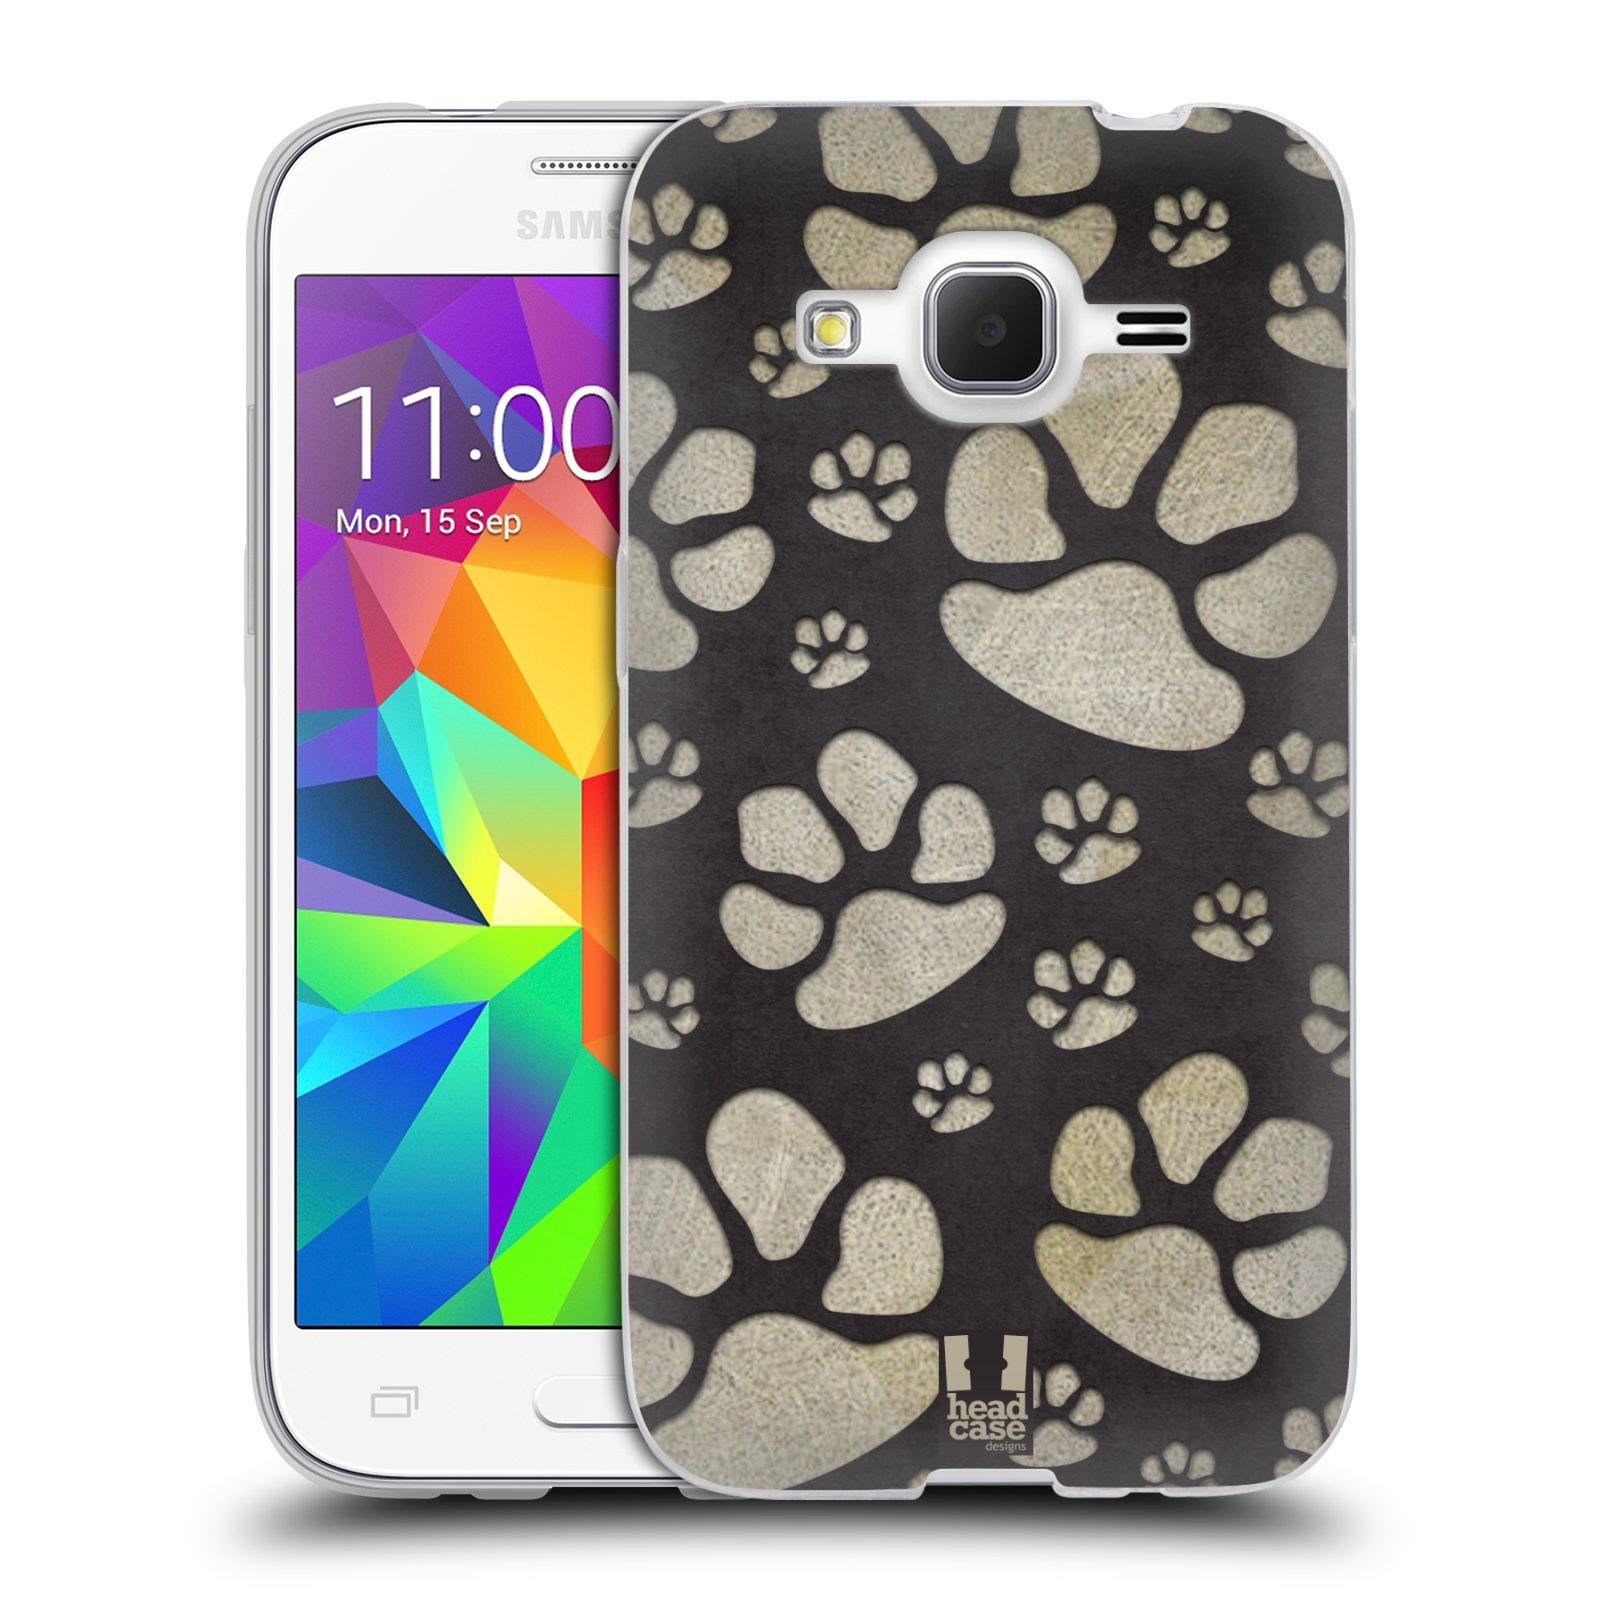 Silikonové pouzdro na mobil Samsung Galaxy Core Prime LTE HEAD CASE TLAPKY ŠEDÉ (Silikonový kryt či obal na mobilní telefon Samsung Galaxy Core Prime LTE SM-G360)